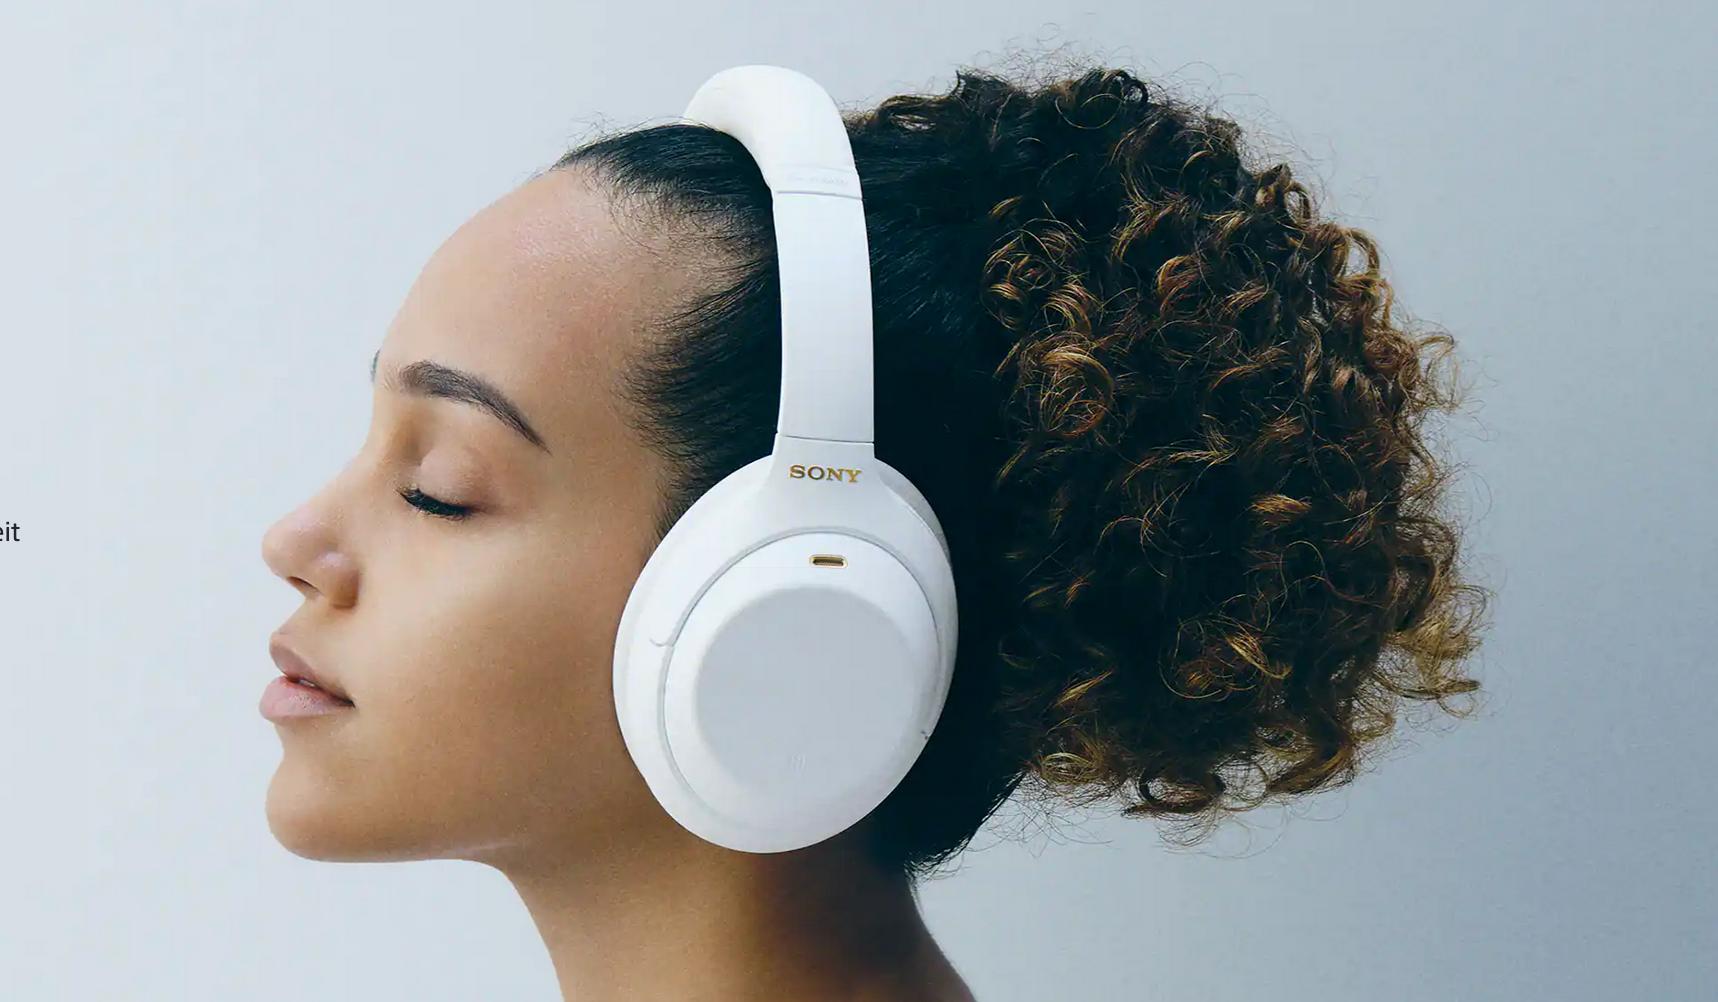 Sony kabellose Kopfhörer mit Noise Cancelling WH-1000XM4